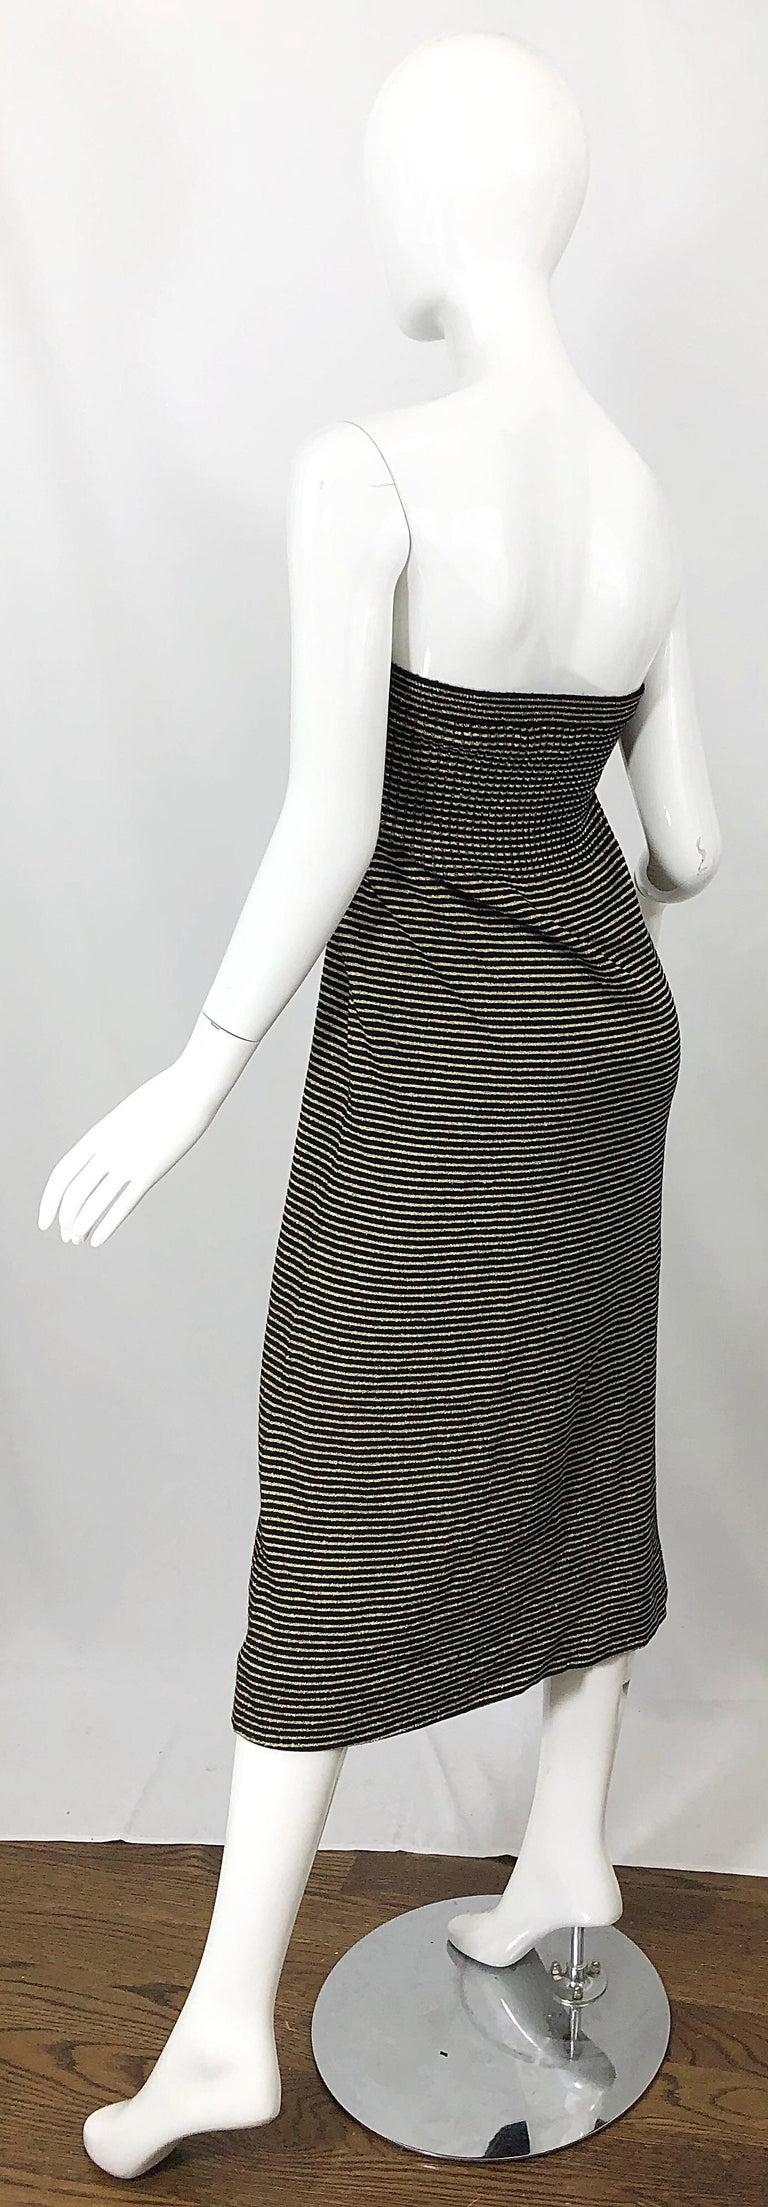 Vintage Yves Saint Laurent YSL 70s Gold Black Strapless Knit Dress or Maxi Skirt For Sale 9